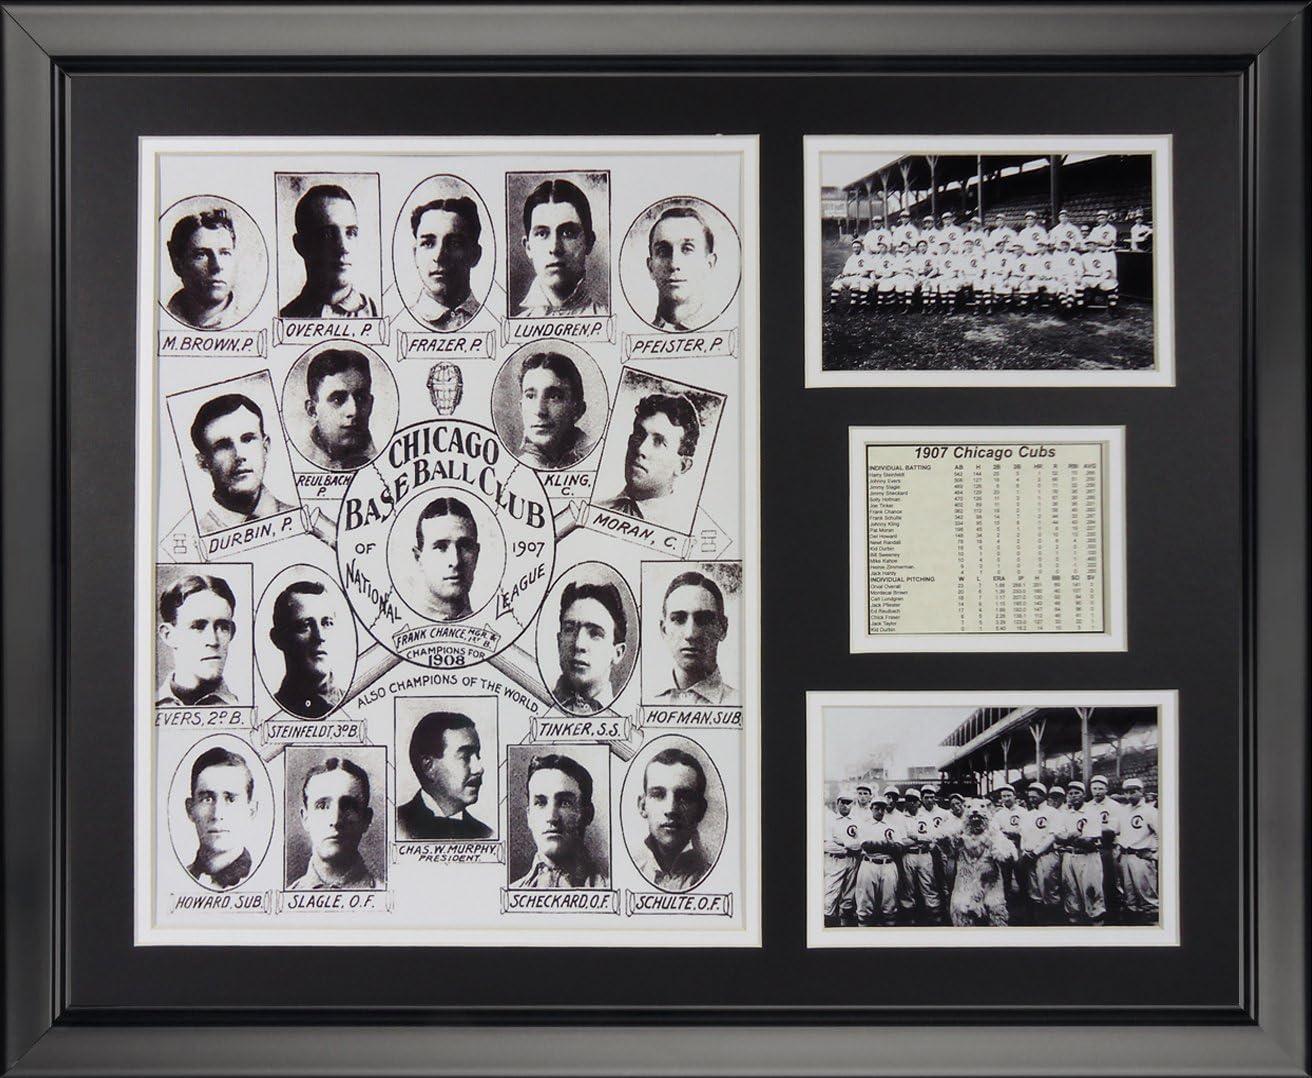 16 x 20 Legends Never Die 1907 Chicago Cubs Framed Photo Collage